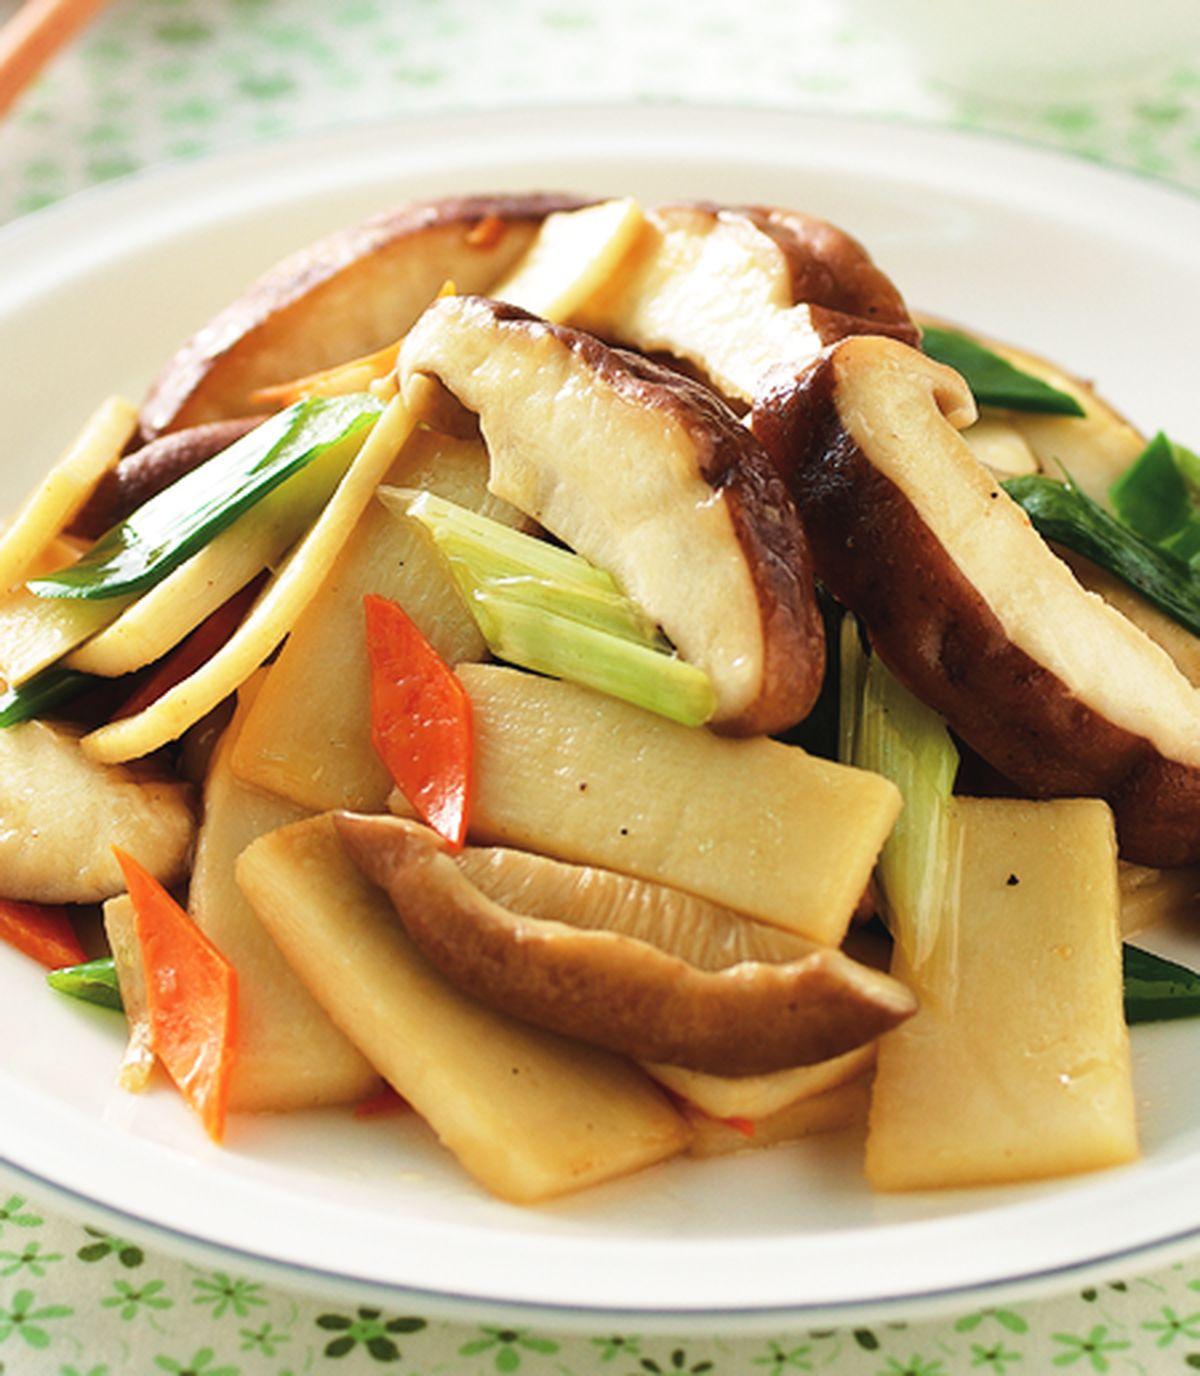 【食譜】筍片炒鮮香菇:www.ytower.com.tw